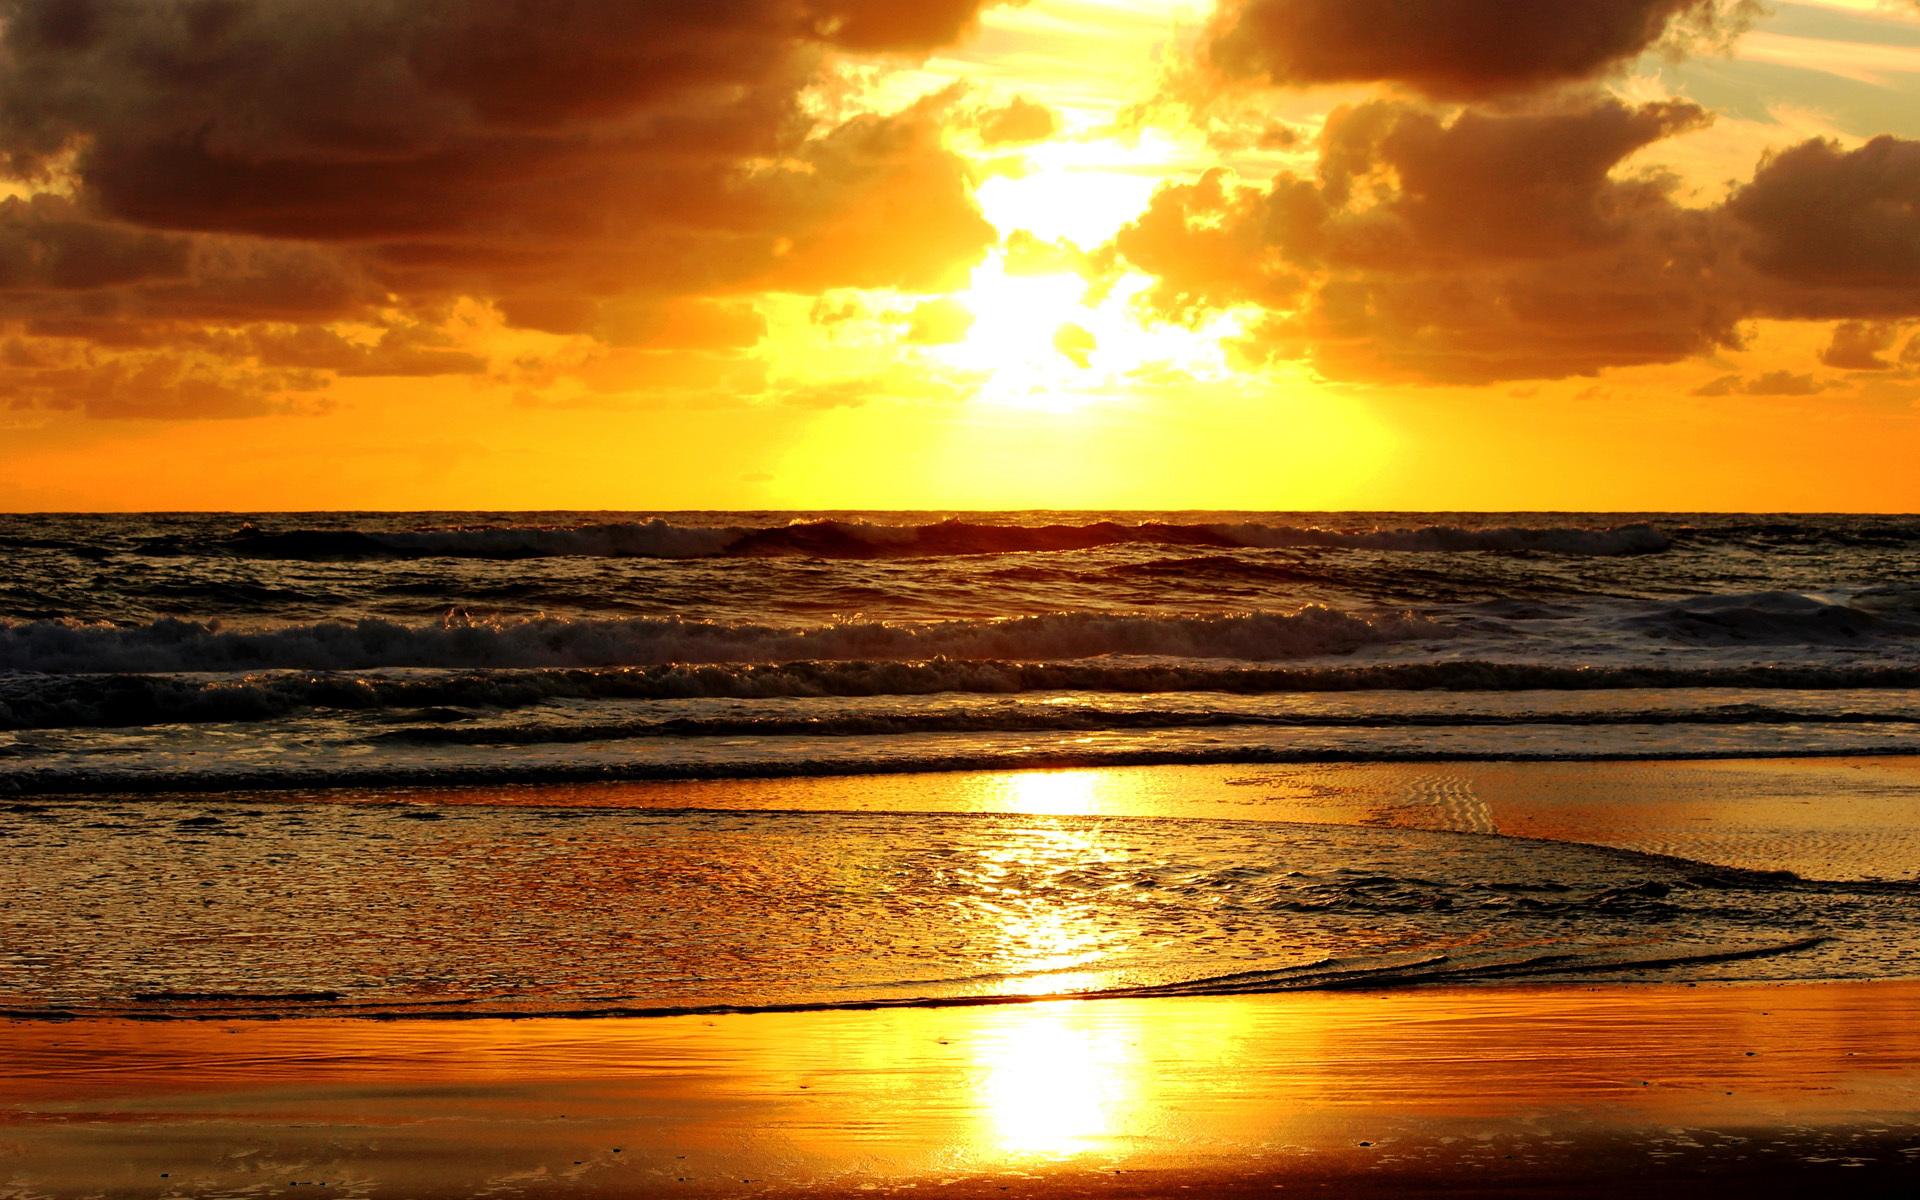 sunset images beach hd